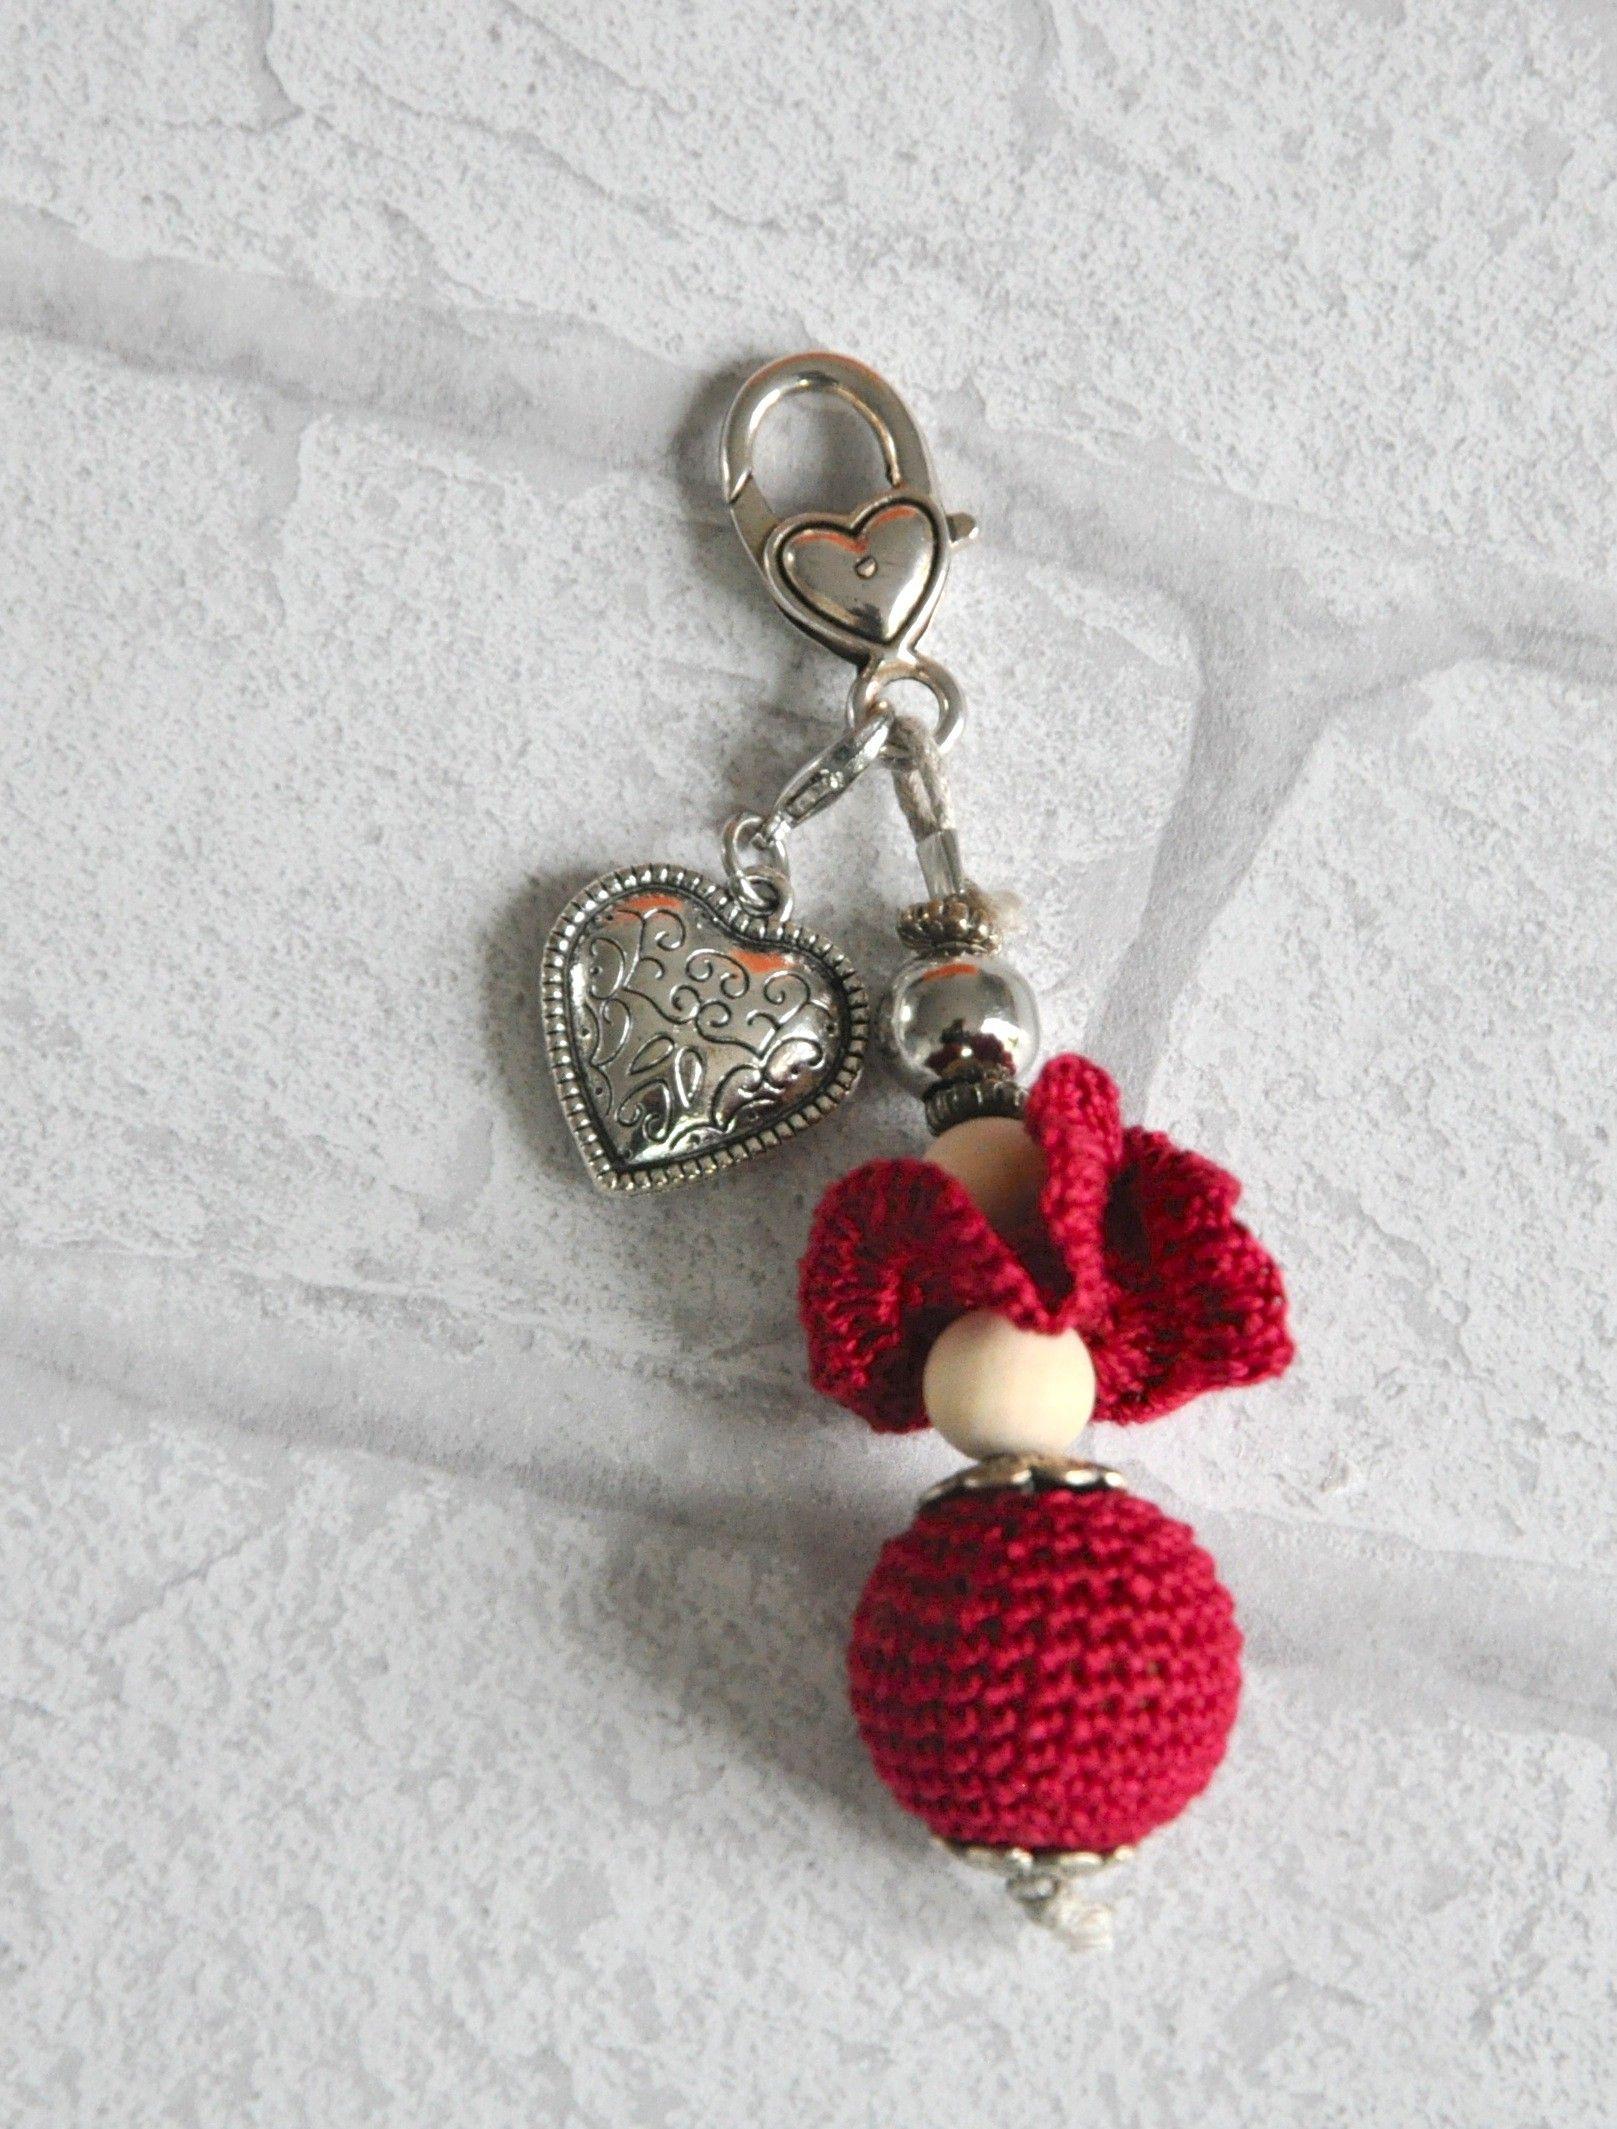 Bijou de sac rouge perle au crochet